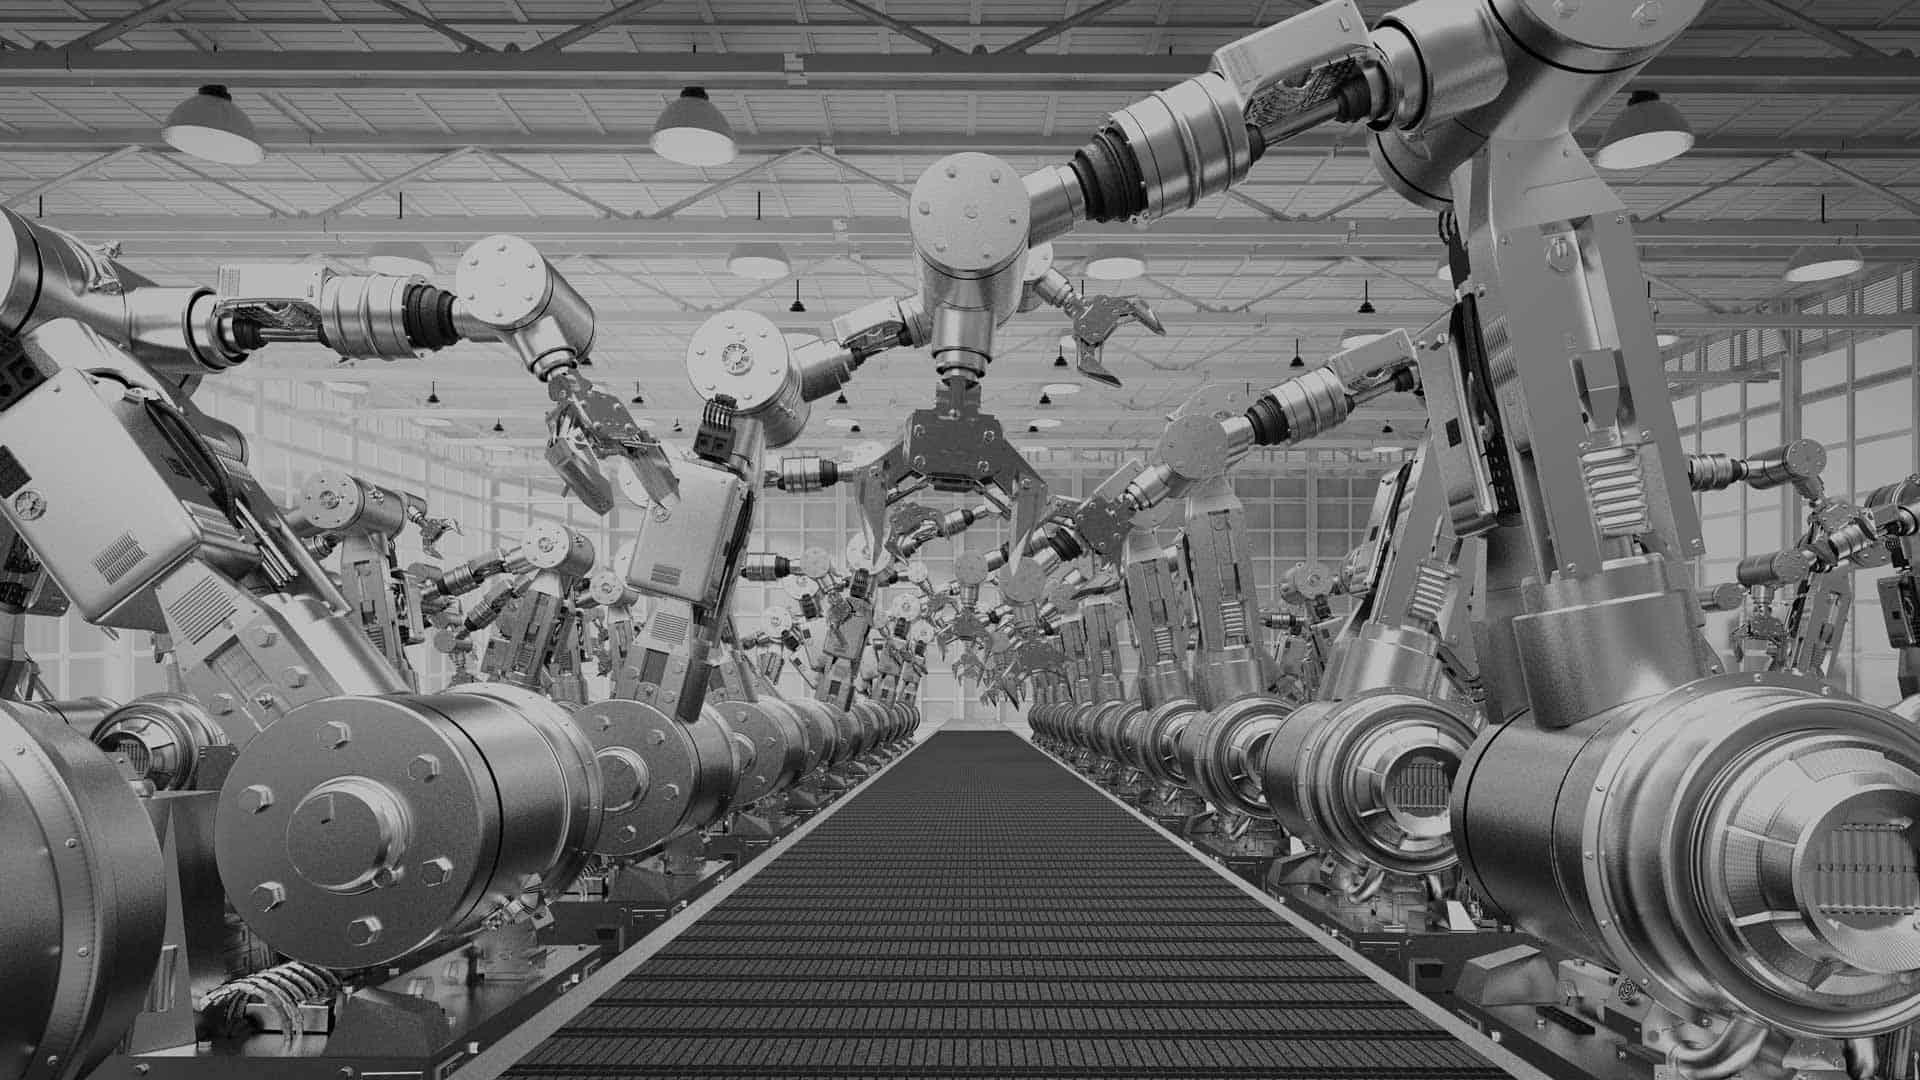 conveyer belt robots